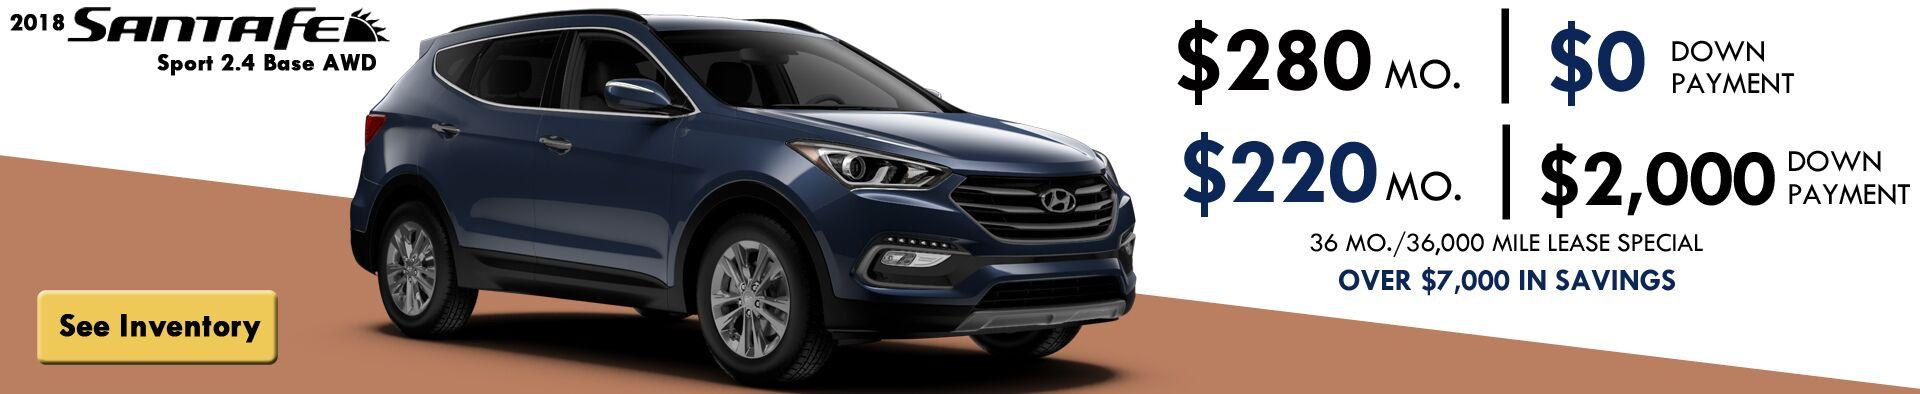 Haggle Free Hyundai Dealer In Golden, CO | Planet Hyundai